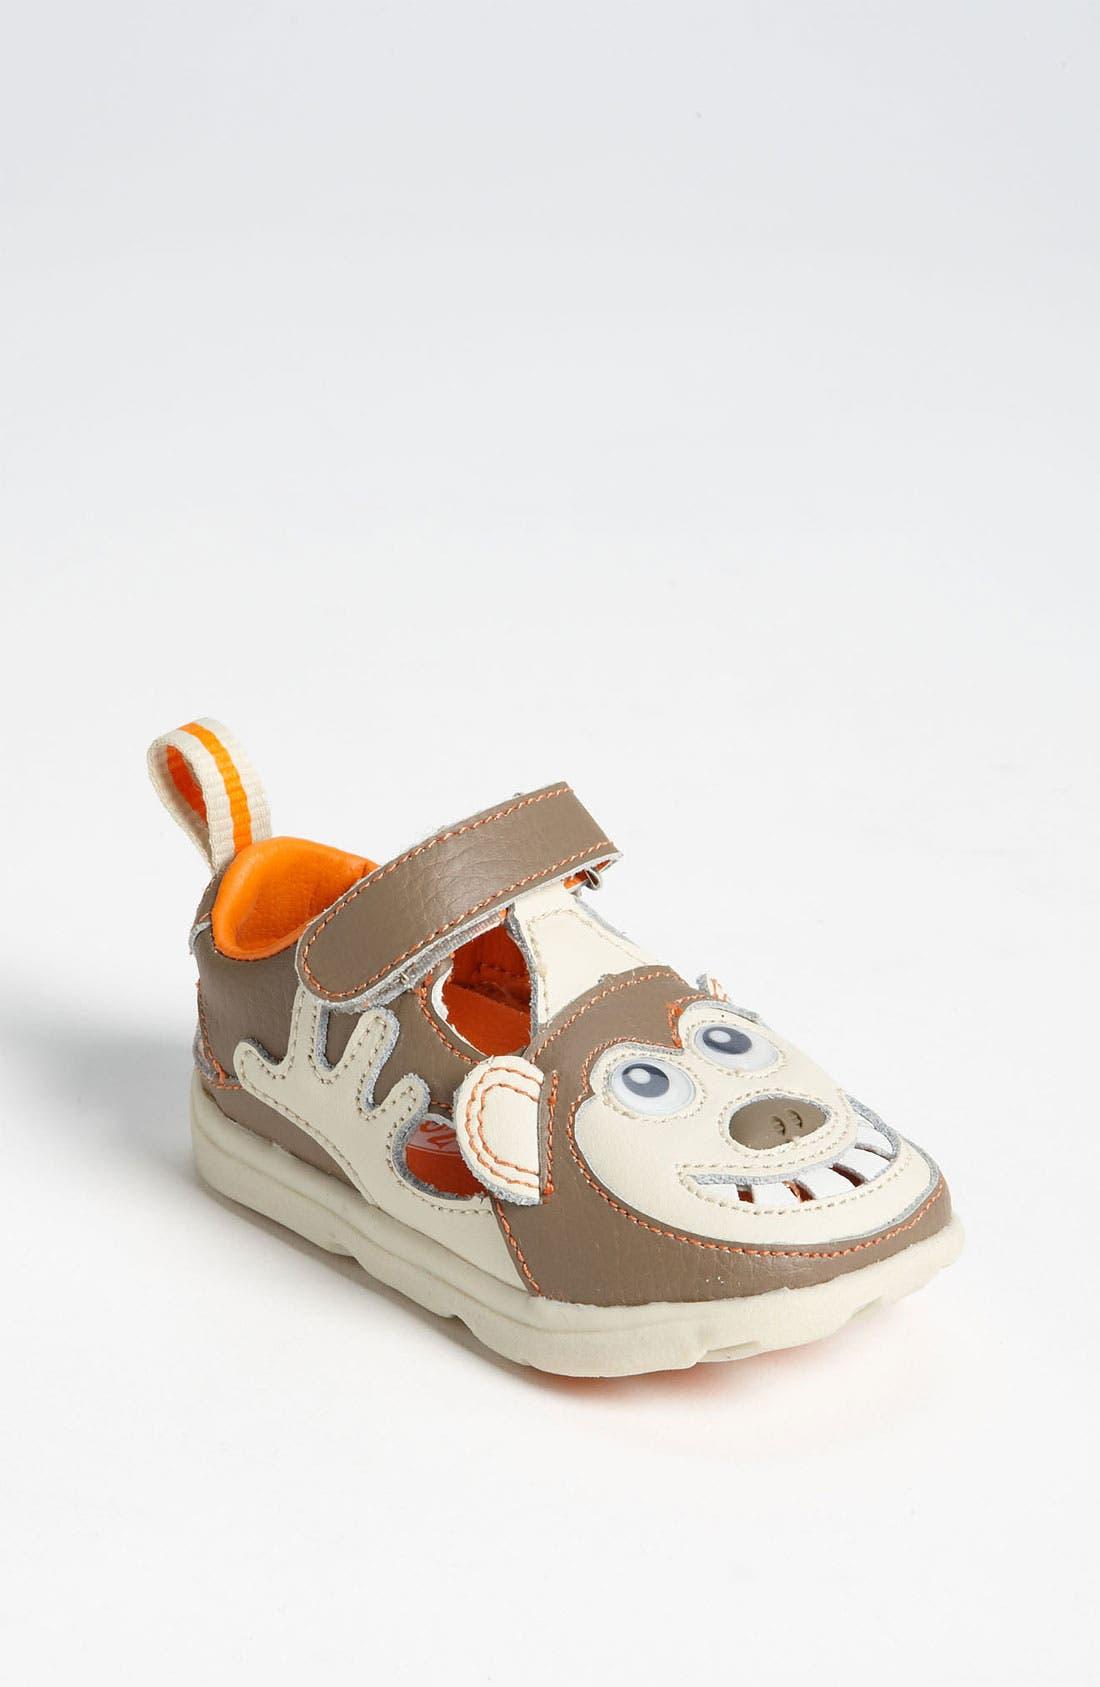 Alternate Image 1 Selected - Zooligans™ 'Monkey' Sport Sandal (Baby, Walker & Toddler)